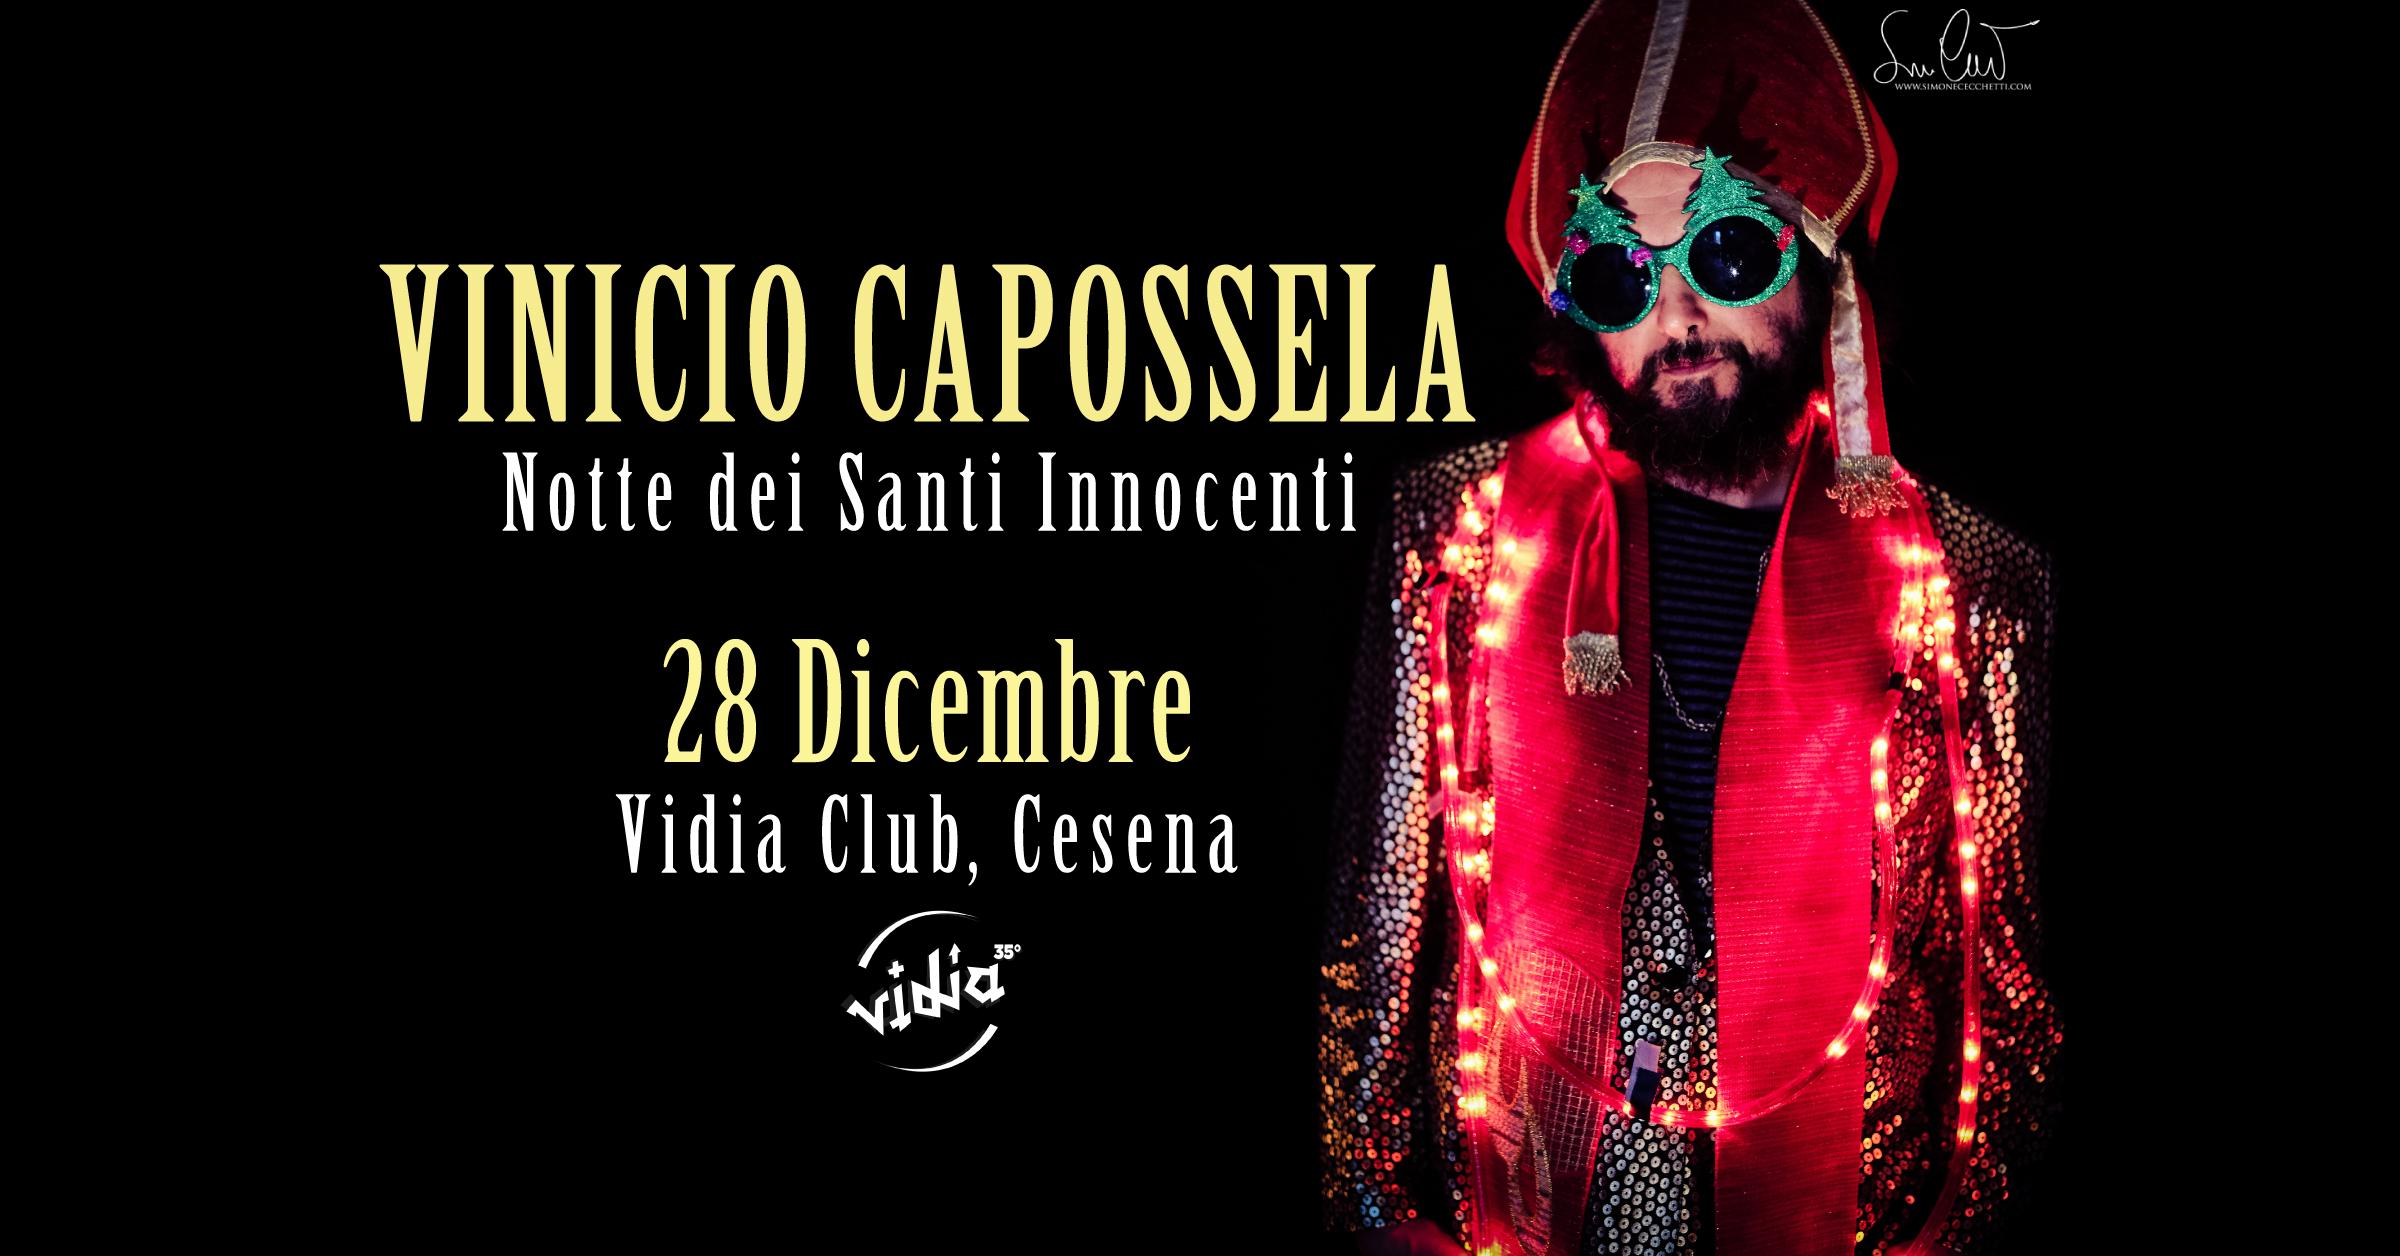 VINICIO CAPOSSELA 2018